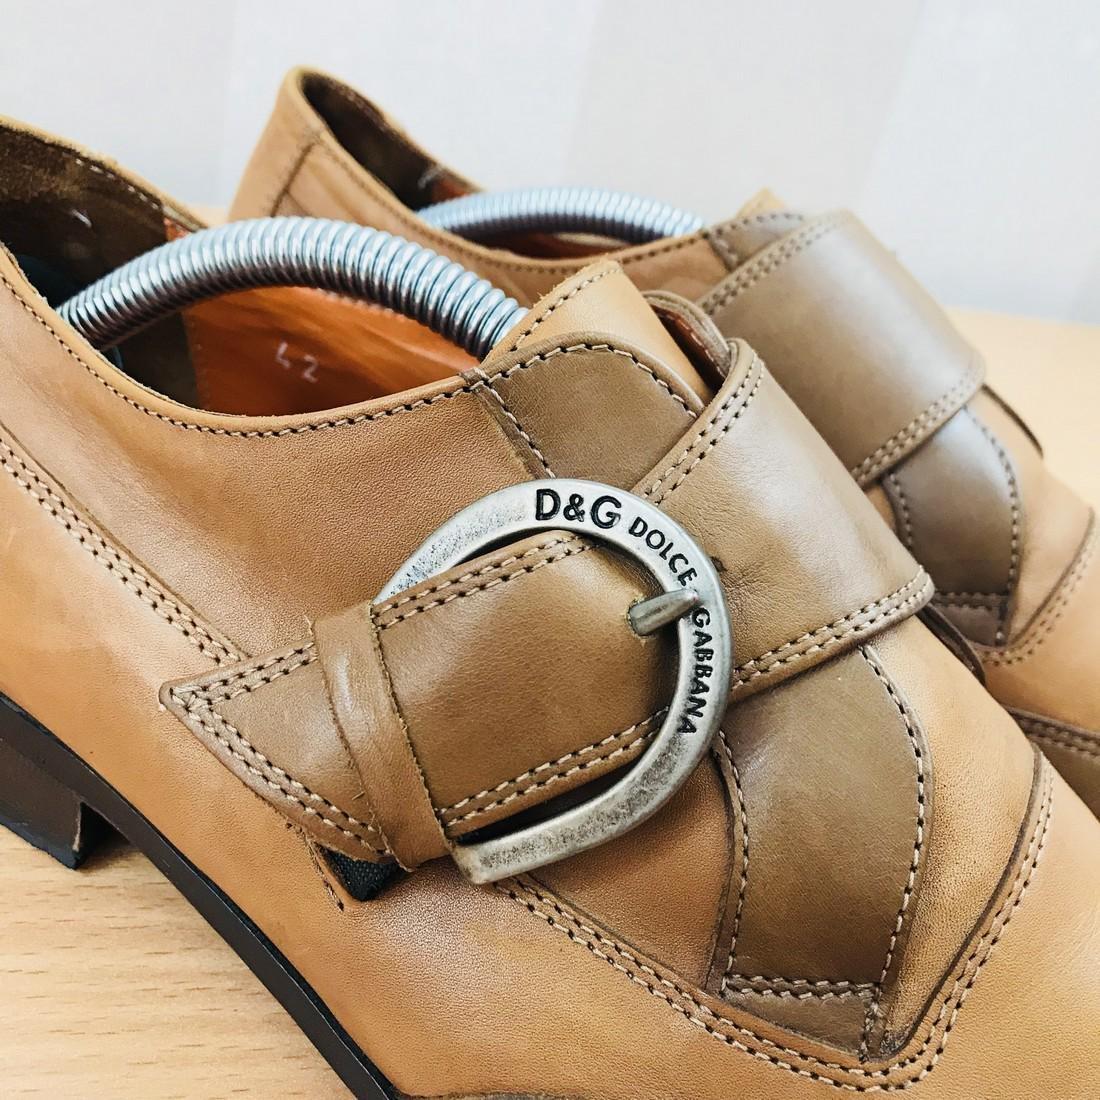 Dolce & Gabbana – Leather Shoes Size EUR 42 UK 8.5 US 9 - 5